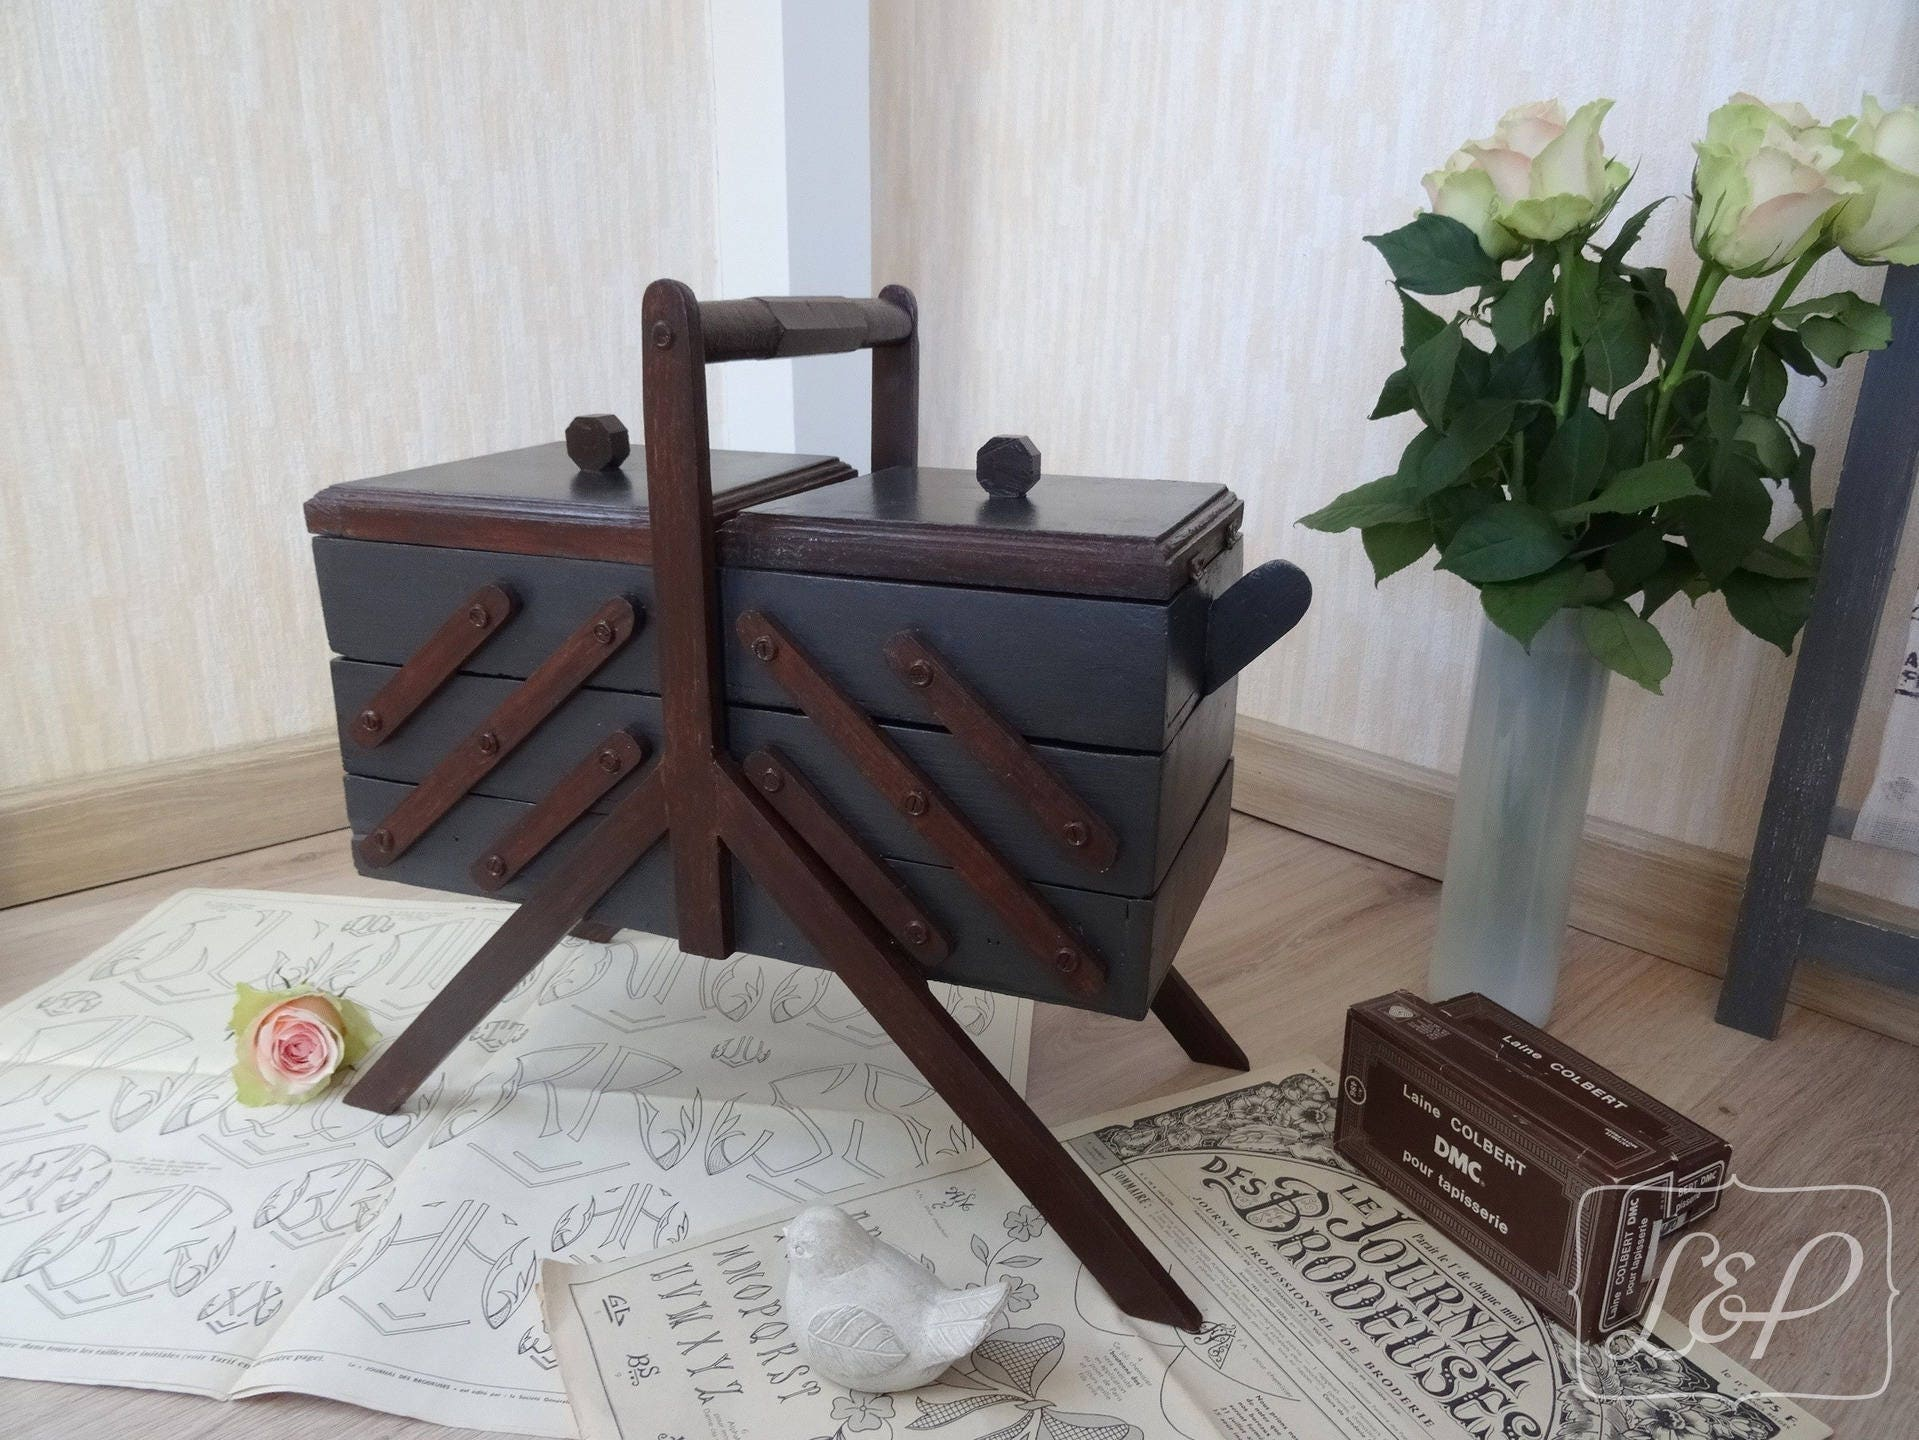 Décoratrice D Intérieur Rodez vintage worker makeover, box knitting art deco furniture sewing patina,  interior decoration, storage, living room furniture